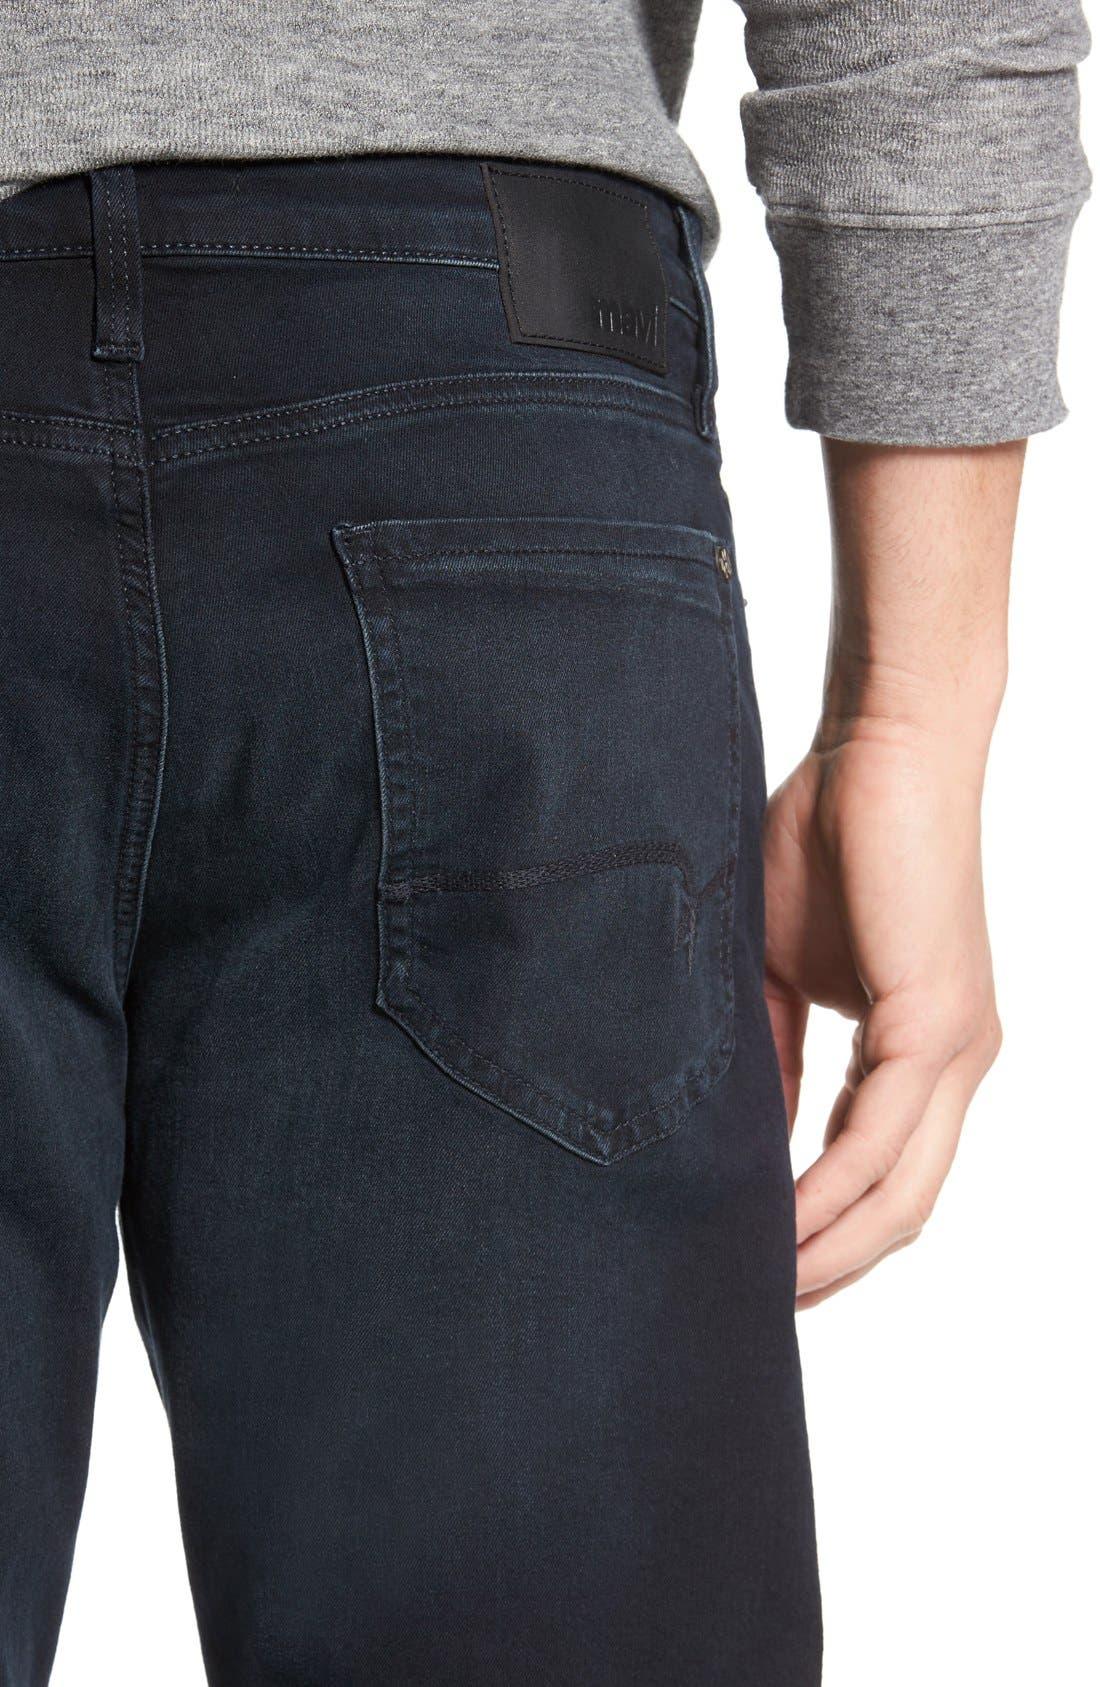 'Myles' Straight Leg Jeans,                             Alternate thumbnail 4, color,                             Ink Brushed Williamsburg